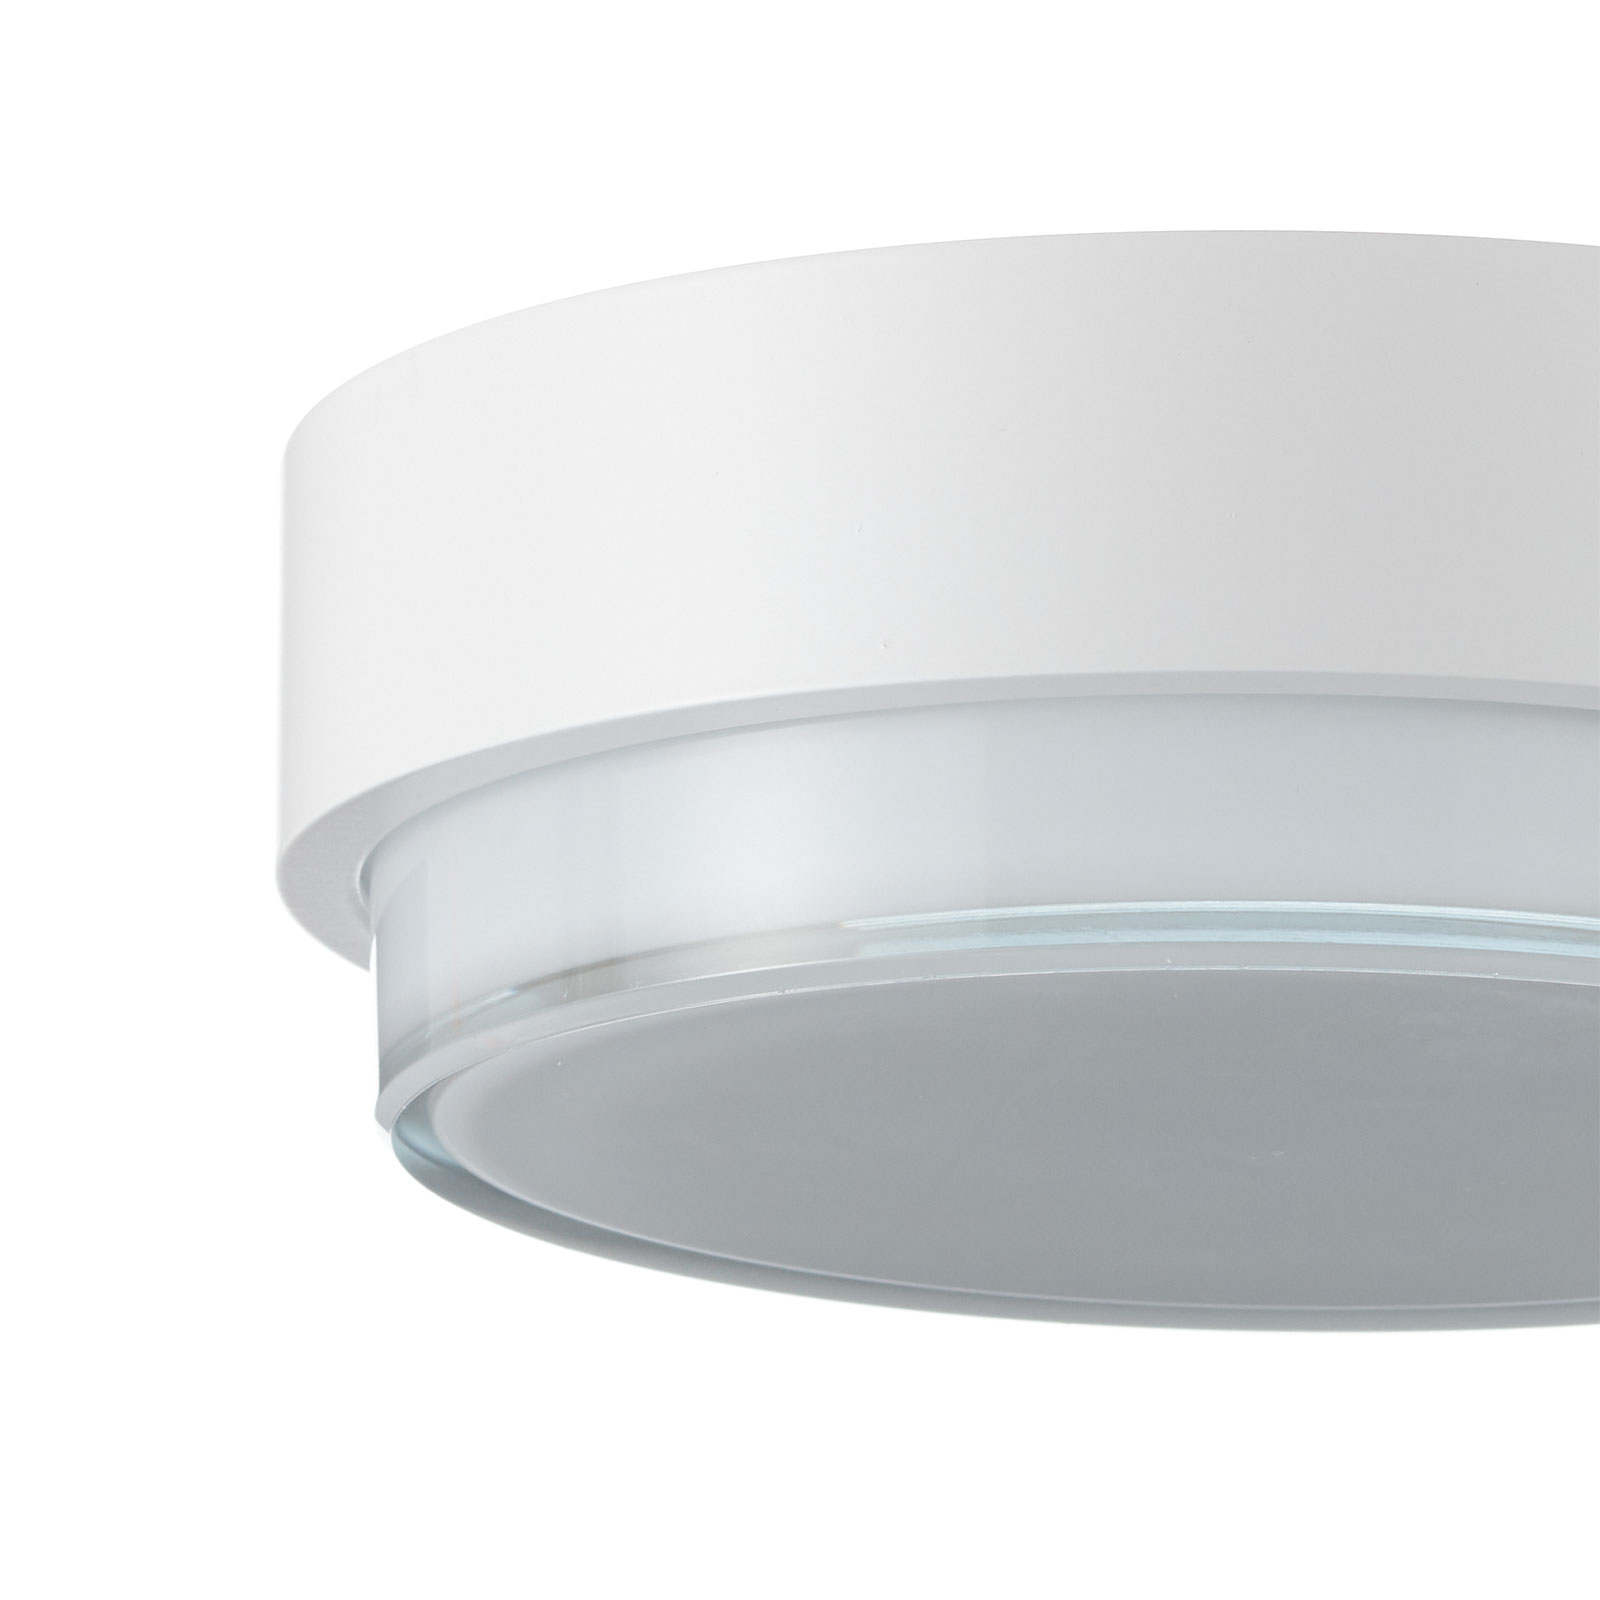 BEGA 50536 LED plafondlamp 930 wit Ø21cm